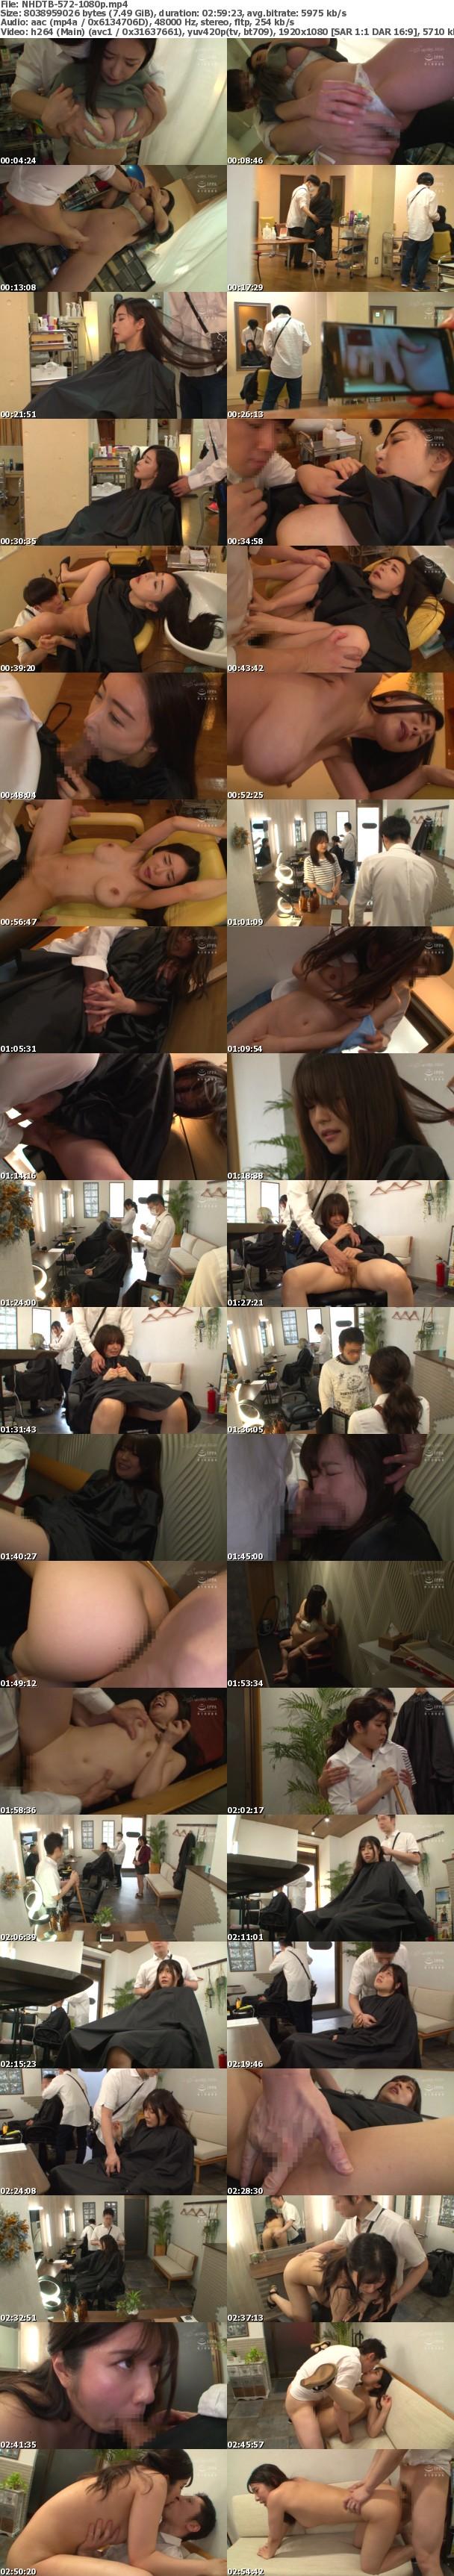 (Full HD) NHDTB-572 美容室でケープの中を全裸にされカット中に何度もこっそりイキさせられる敏感女